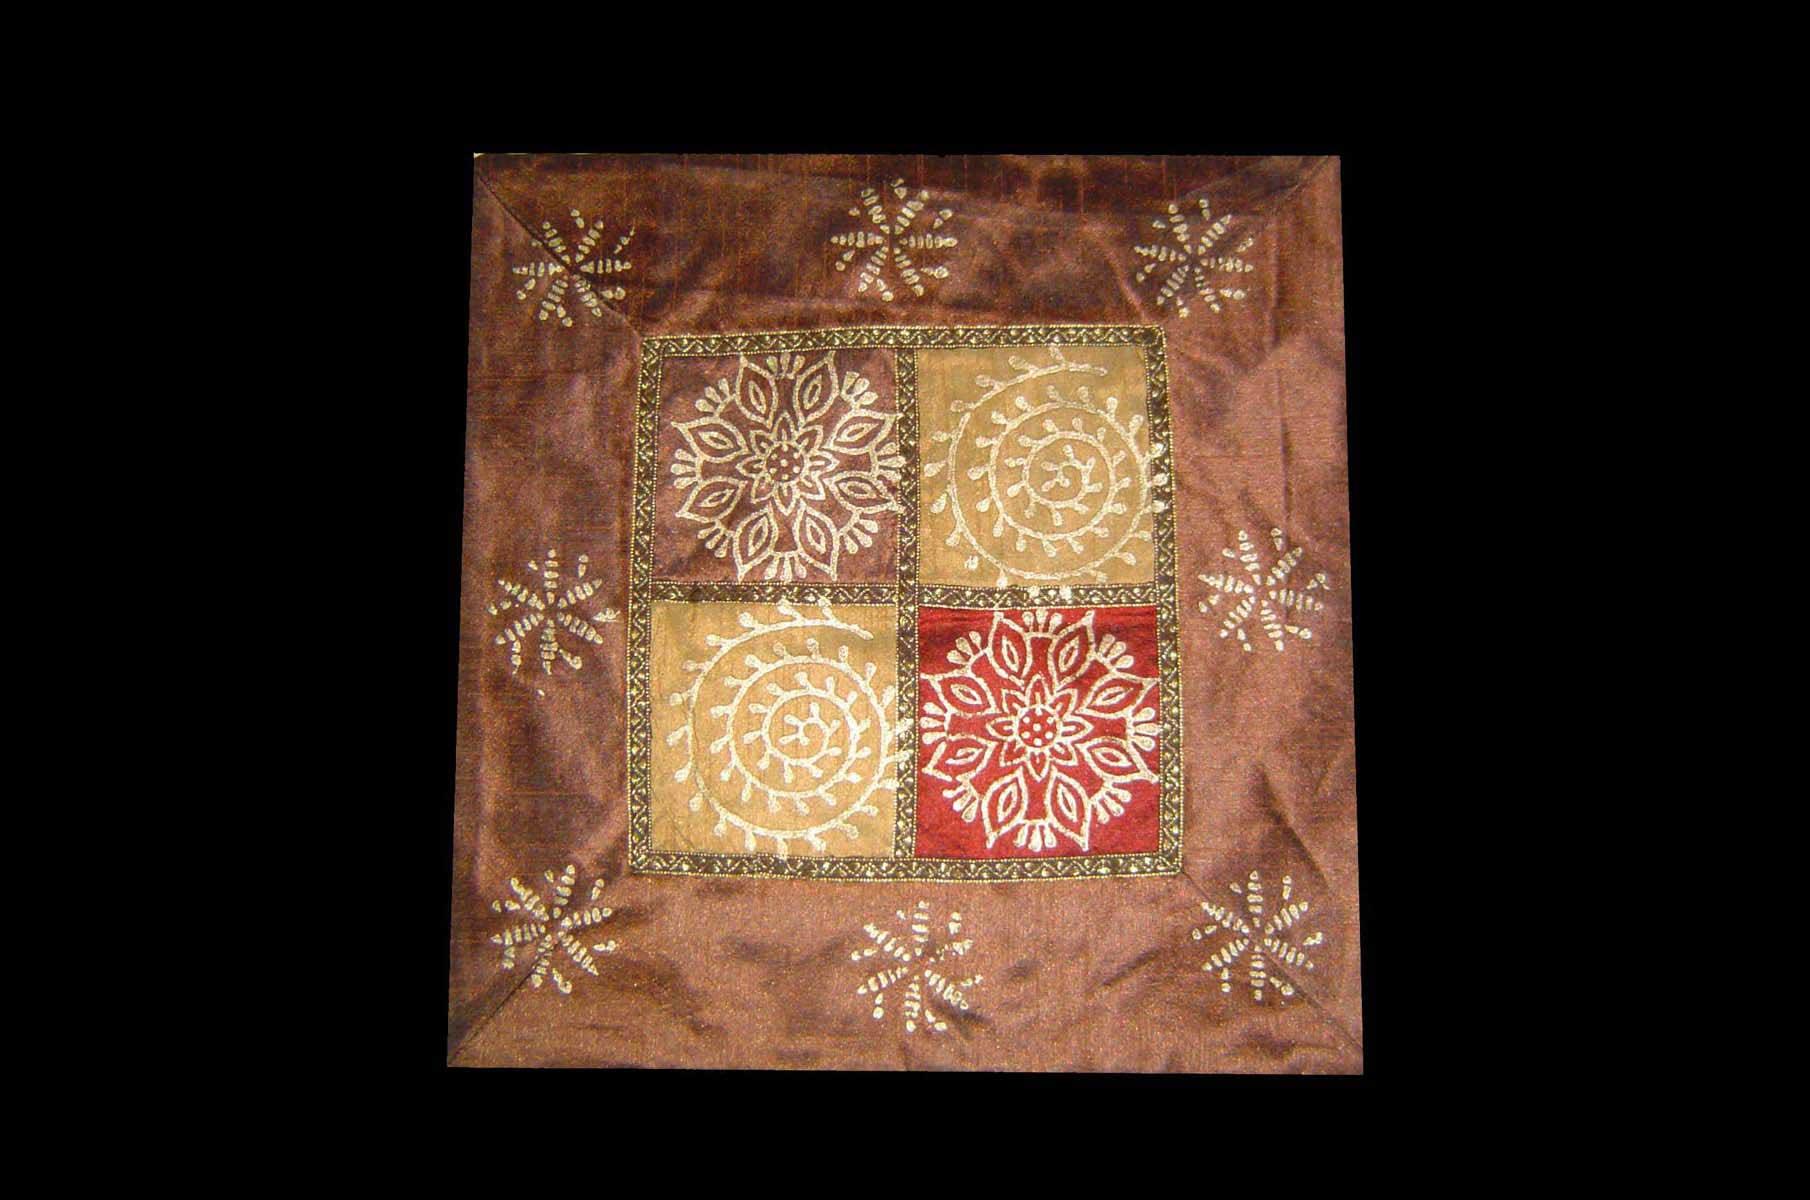 Kashmir Artizan Udaipur Cushion Covers Sofa Cushions  : 16 from indianpurepashmina.com size 1810 x 1200 jpeg 154kB